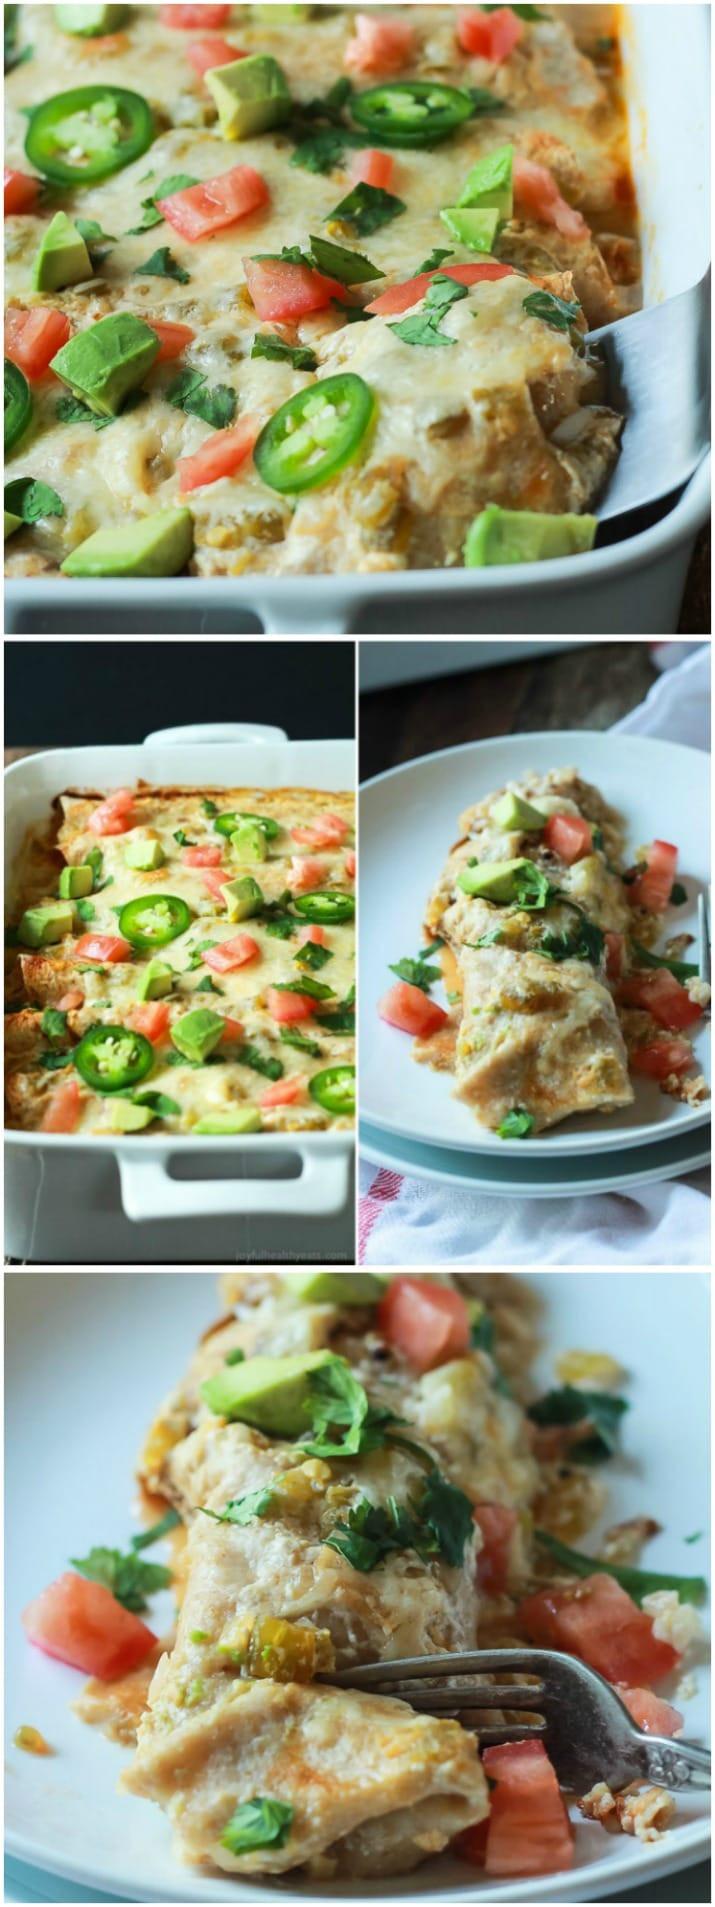 Easy Healthy Enchiladas  Easy Chicken Enchilada Recipe with Creamy Green Chili